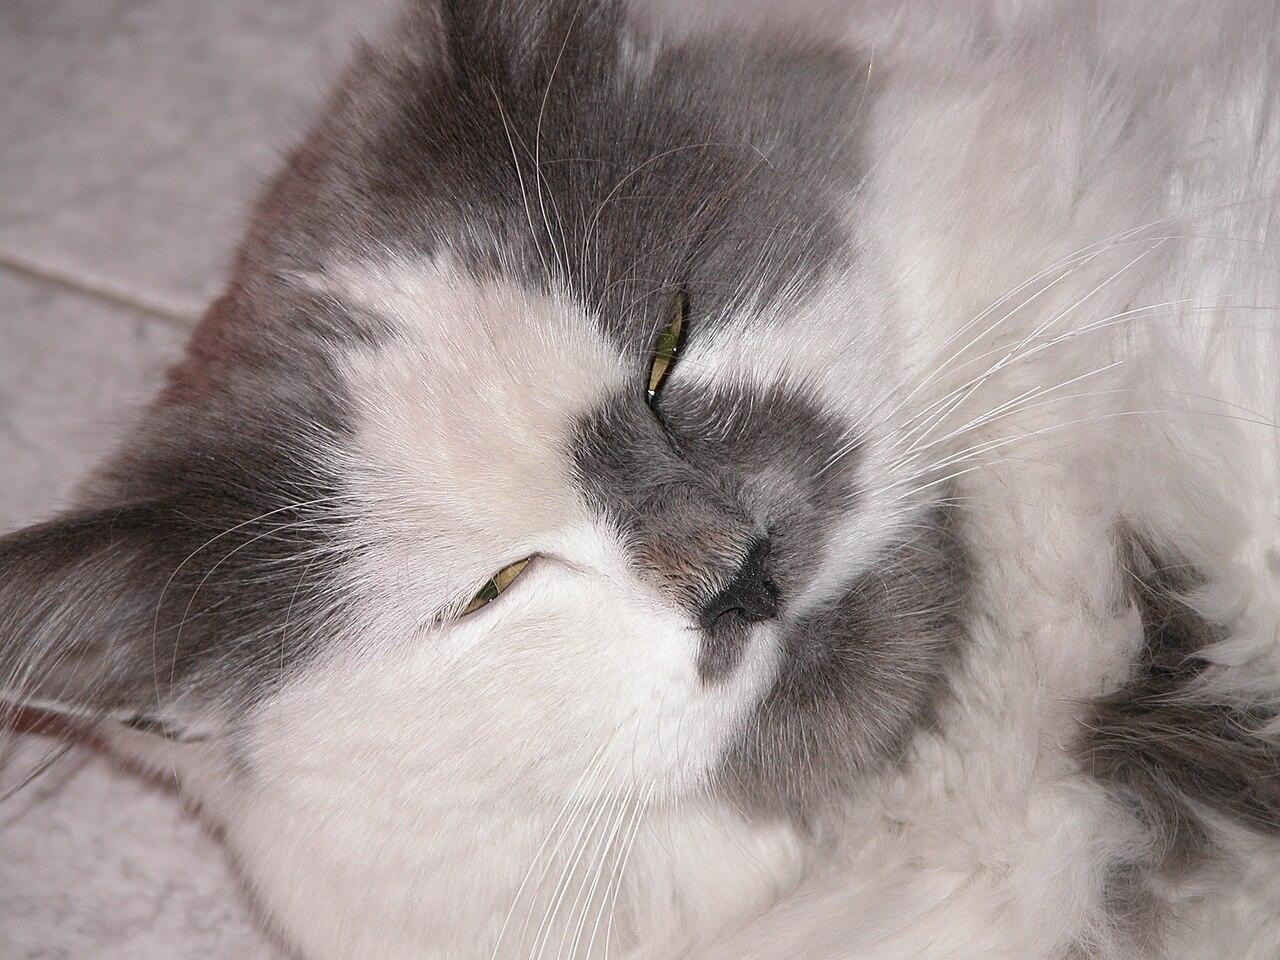 Cat S Eyes Episode